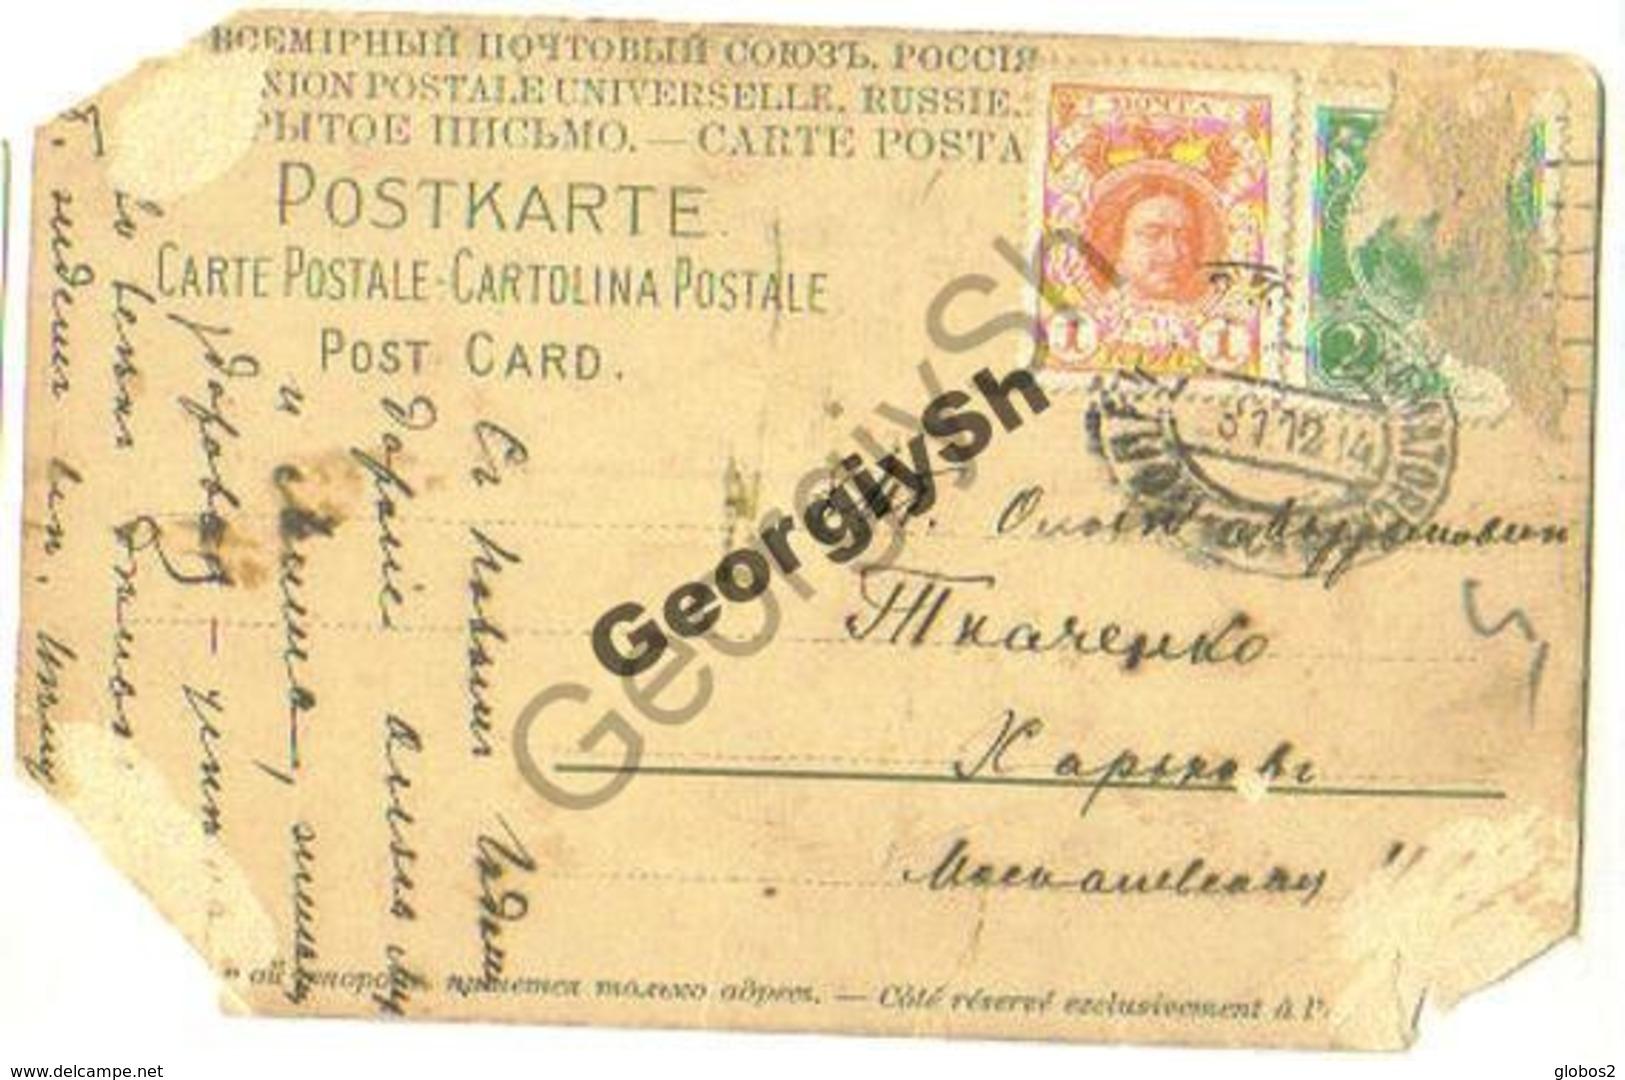 192_002_klein-orange-postal-train-kramatorsk-1914g.jpg